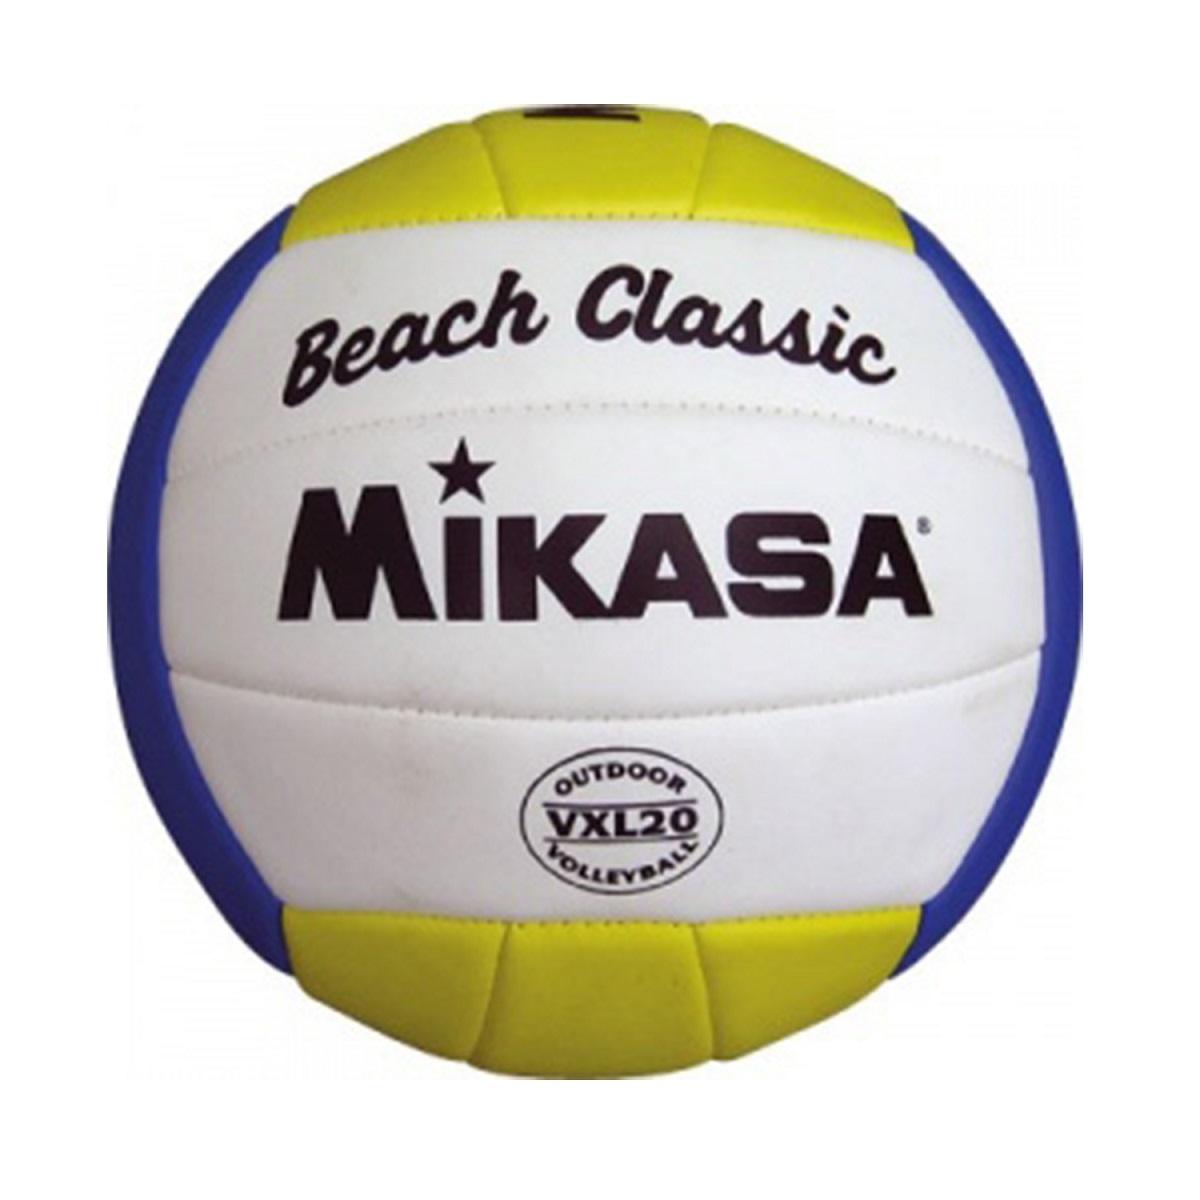 Mikasa Beach Classic VXL20